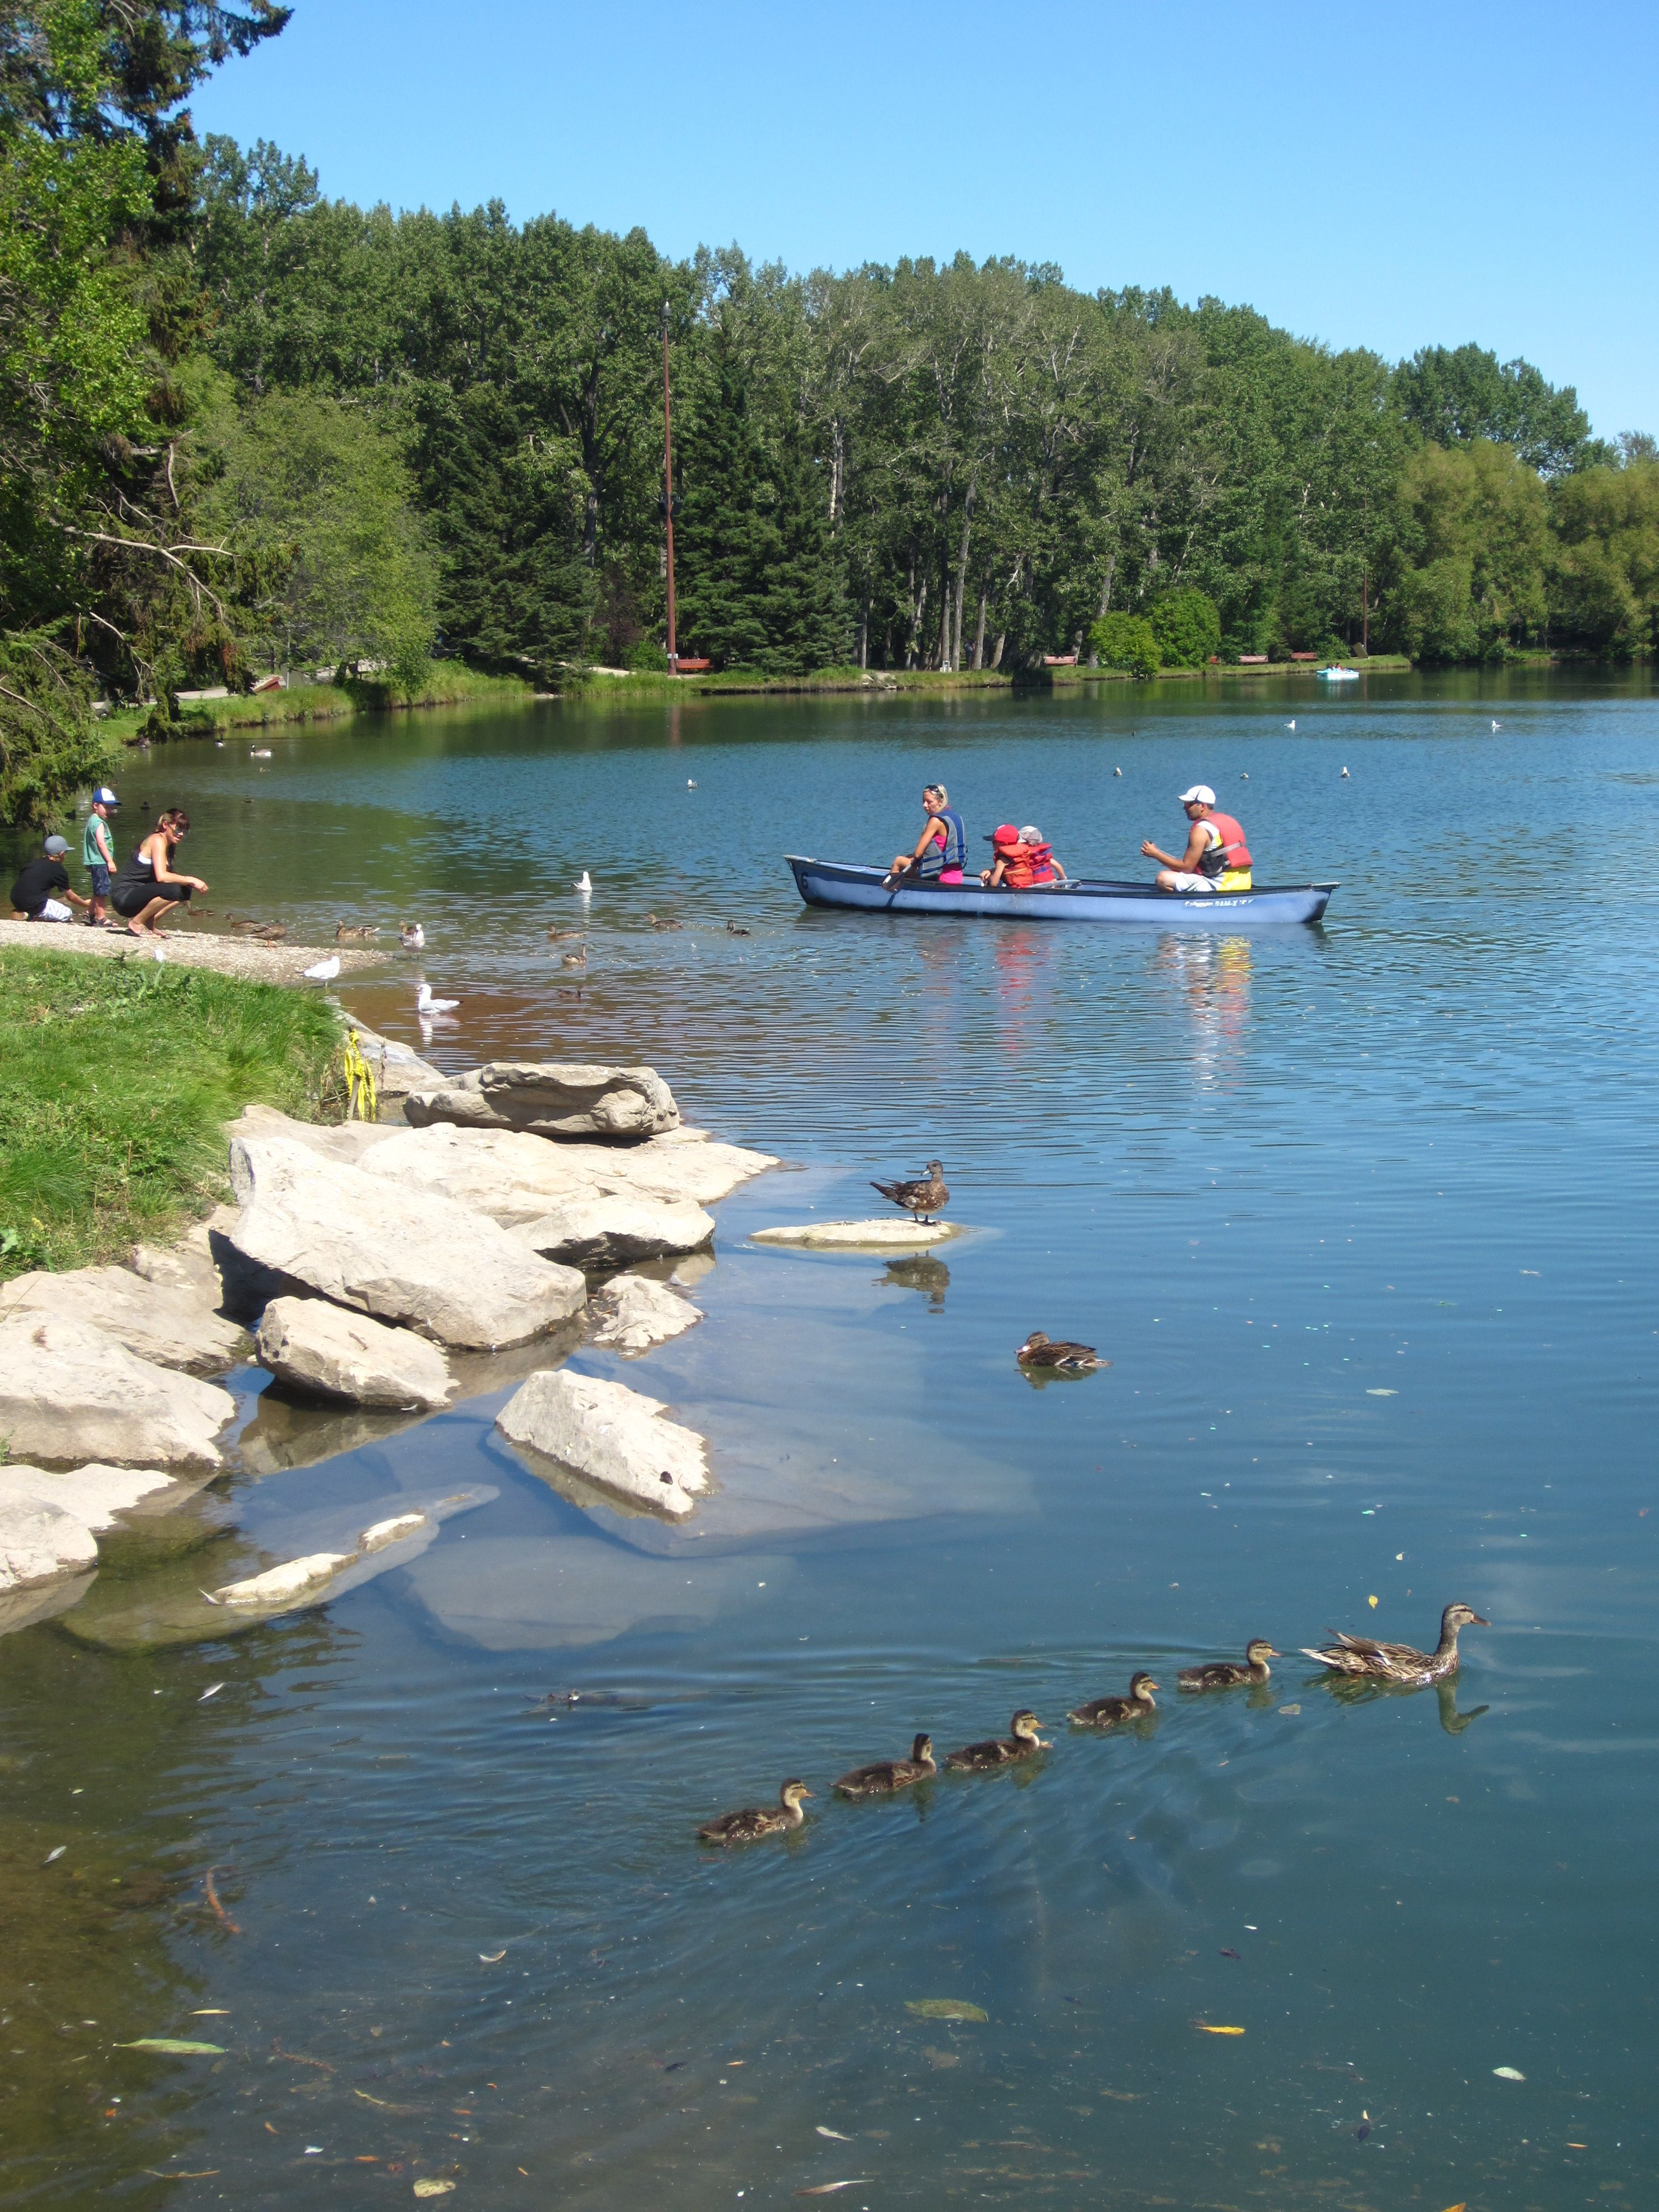 The lagoon at Bowness Park in Calgary, Alberta.